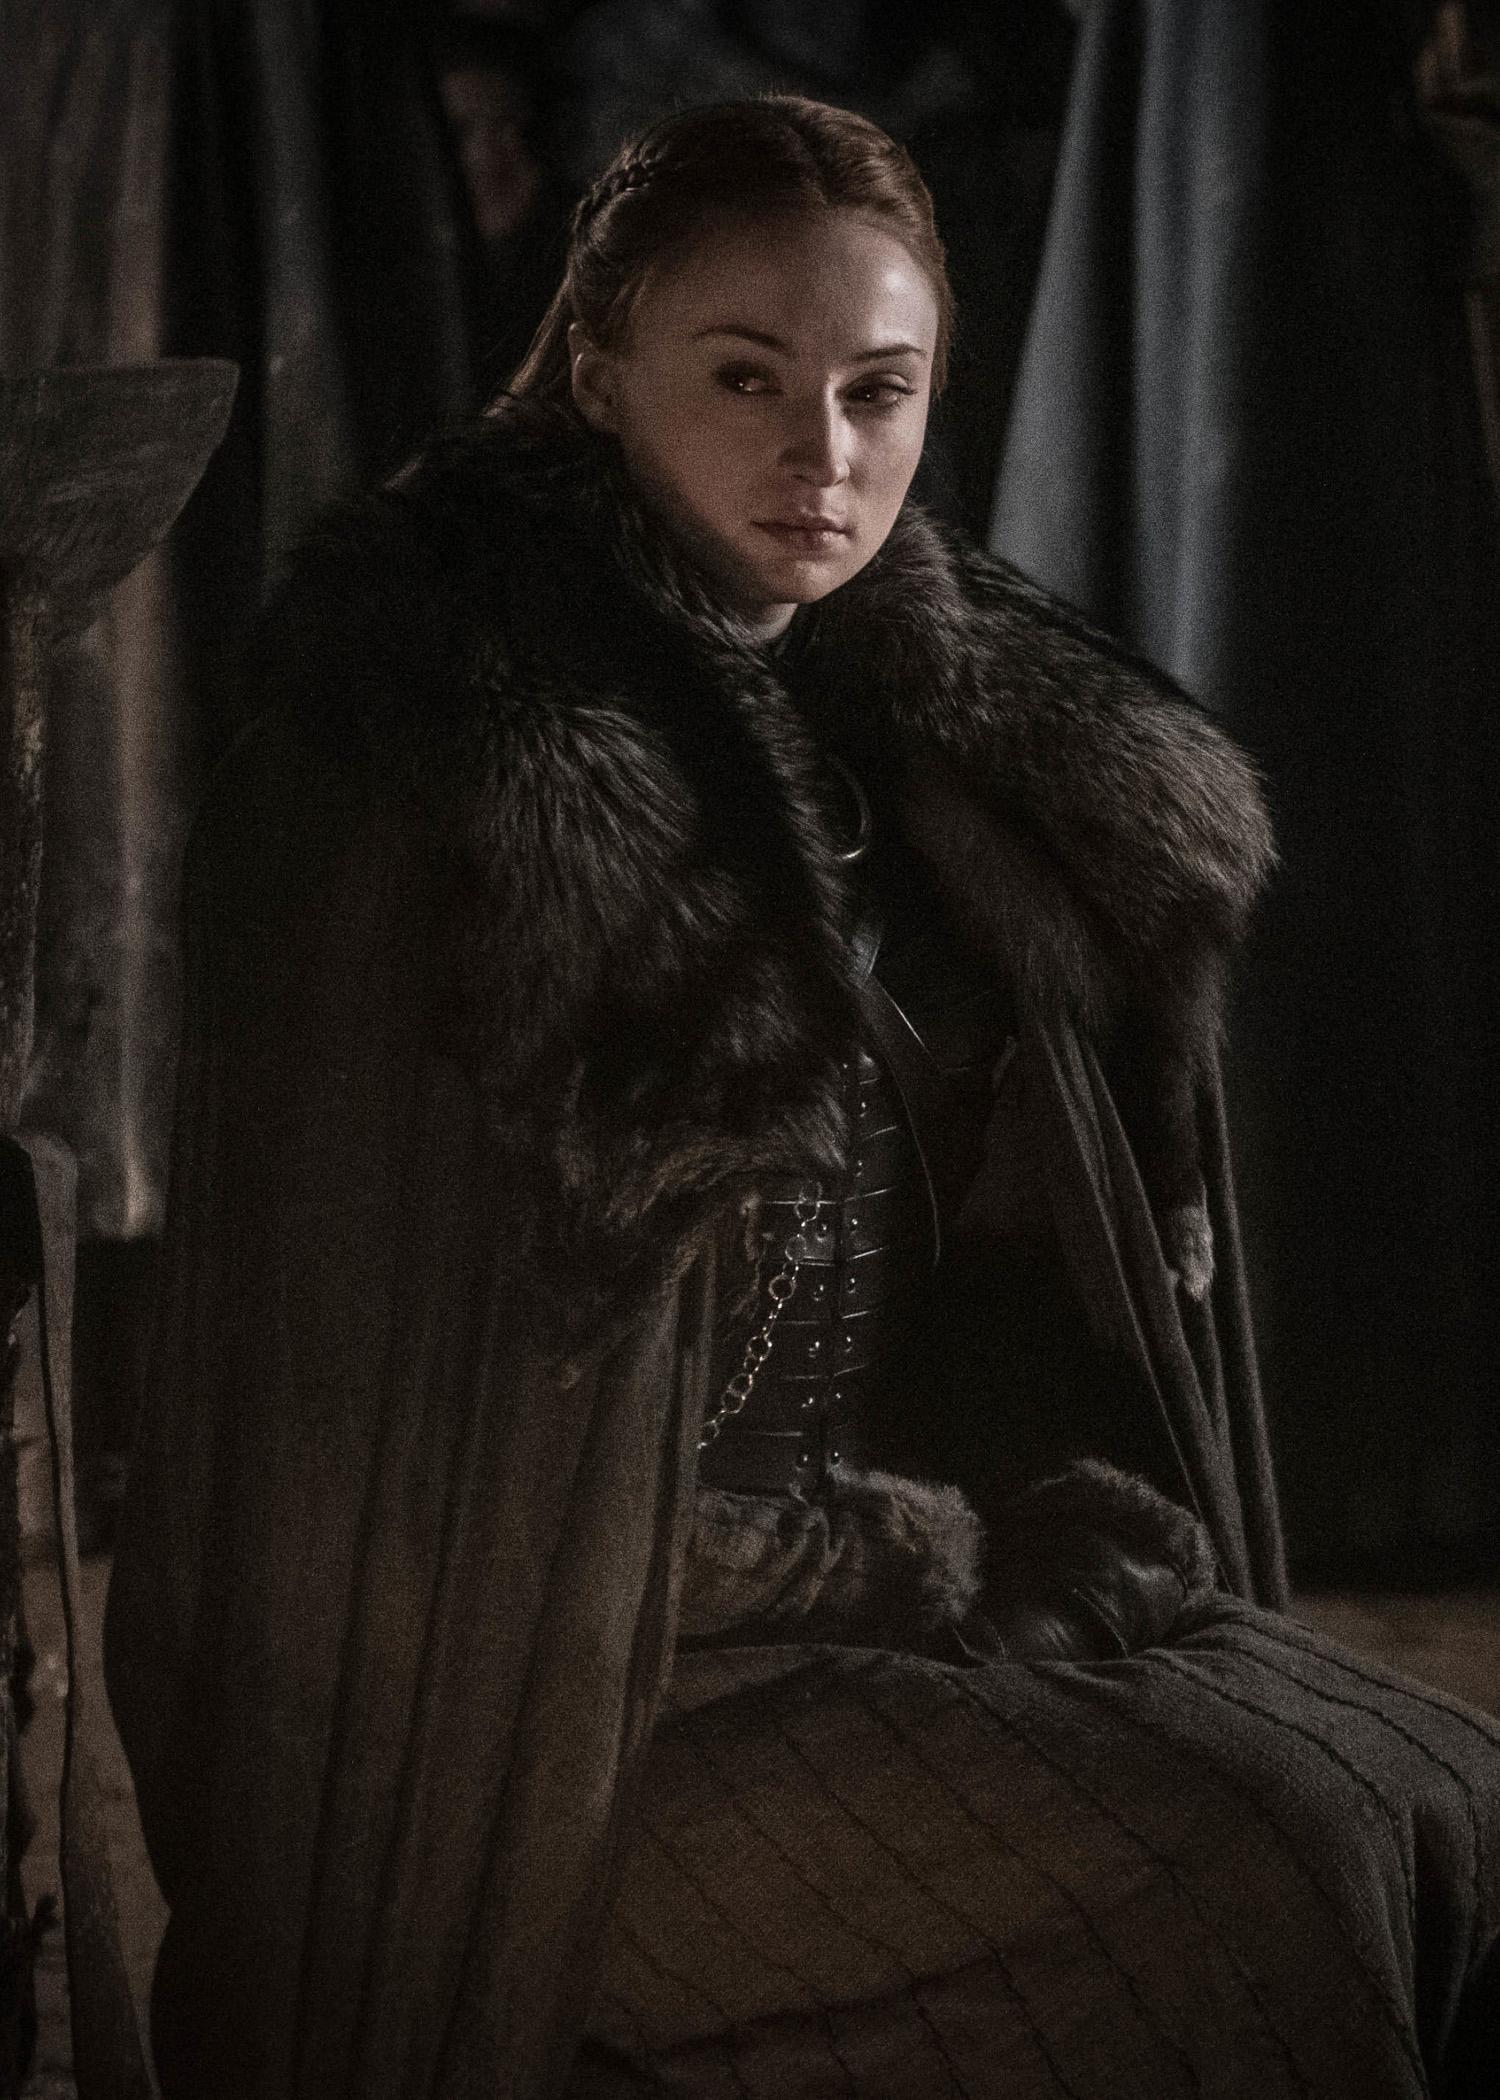 8x03 - The Long Night - Sansa